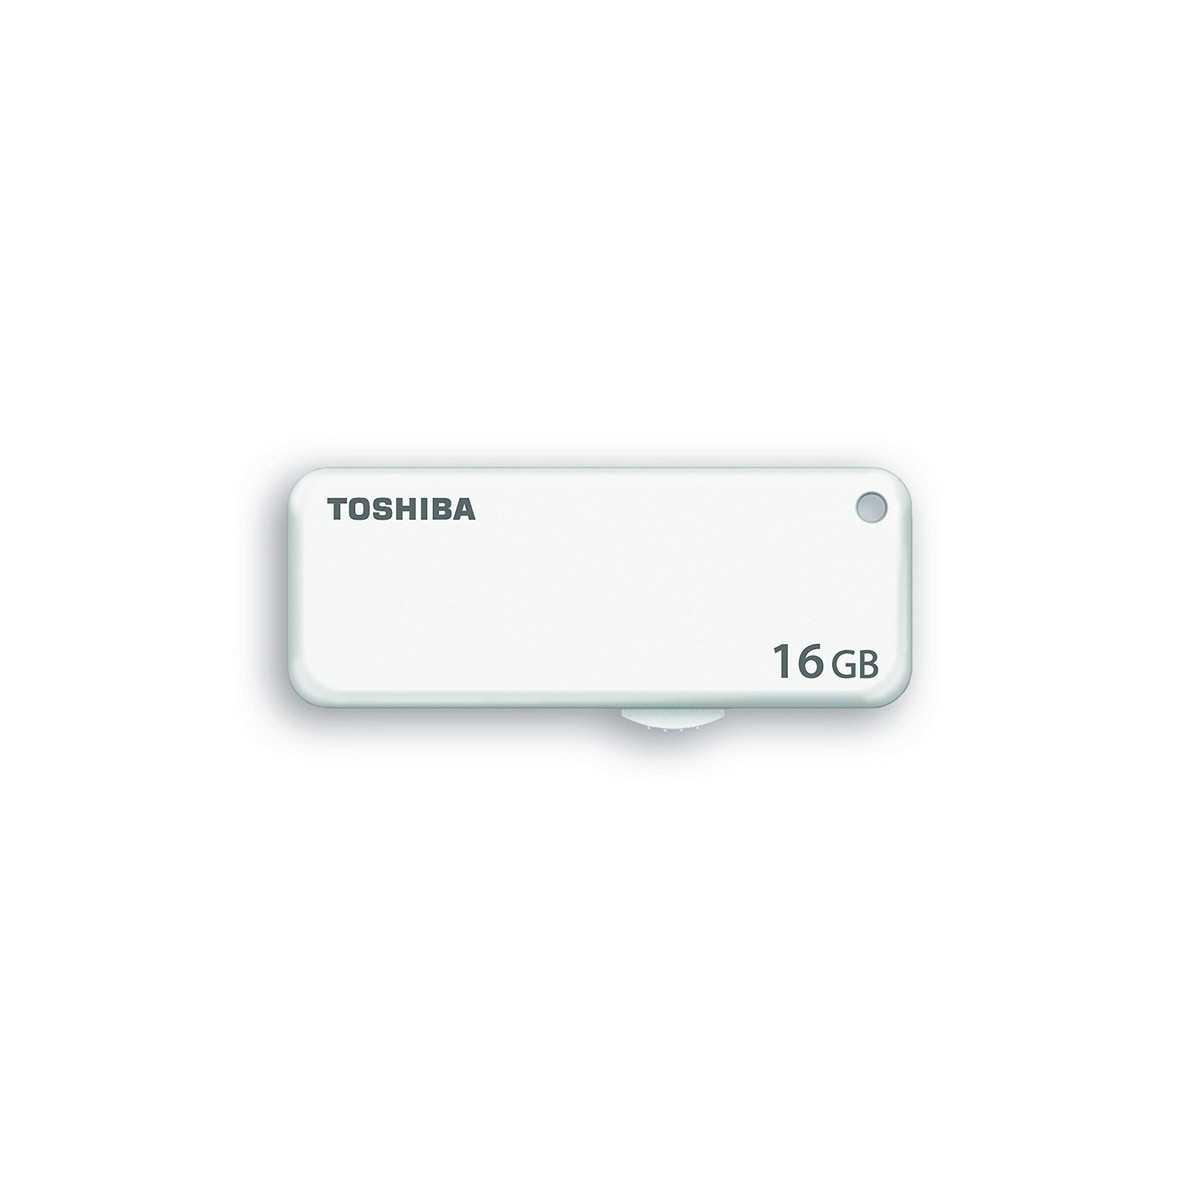 PenDrive Toshiba TransMemory 16GB - Regalo - Doni -